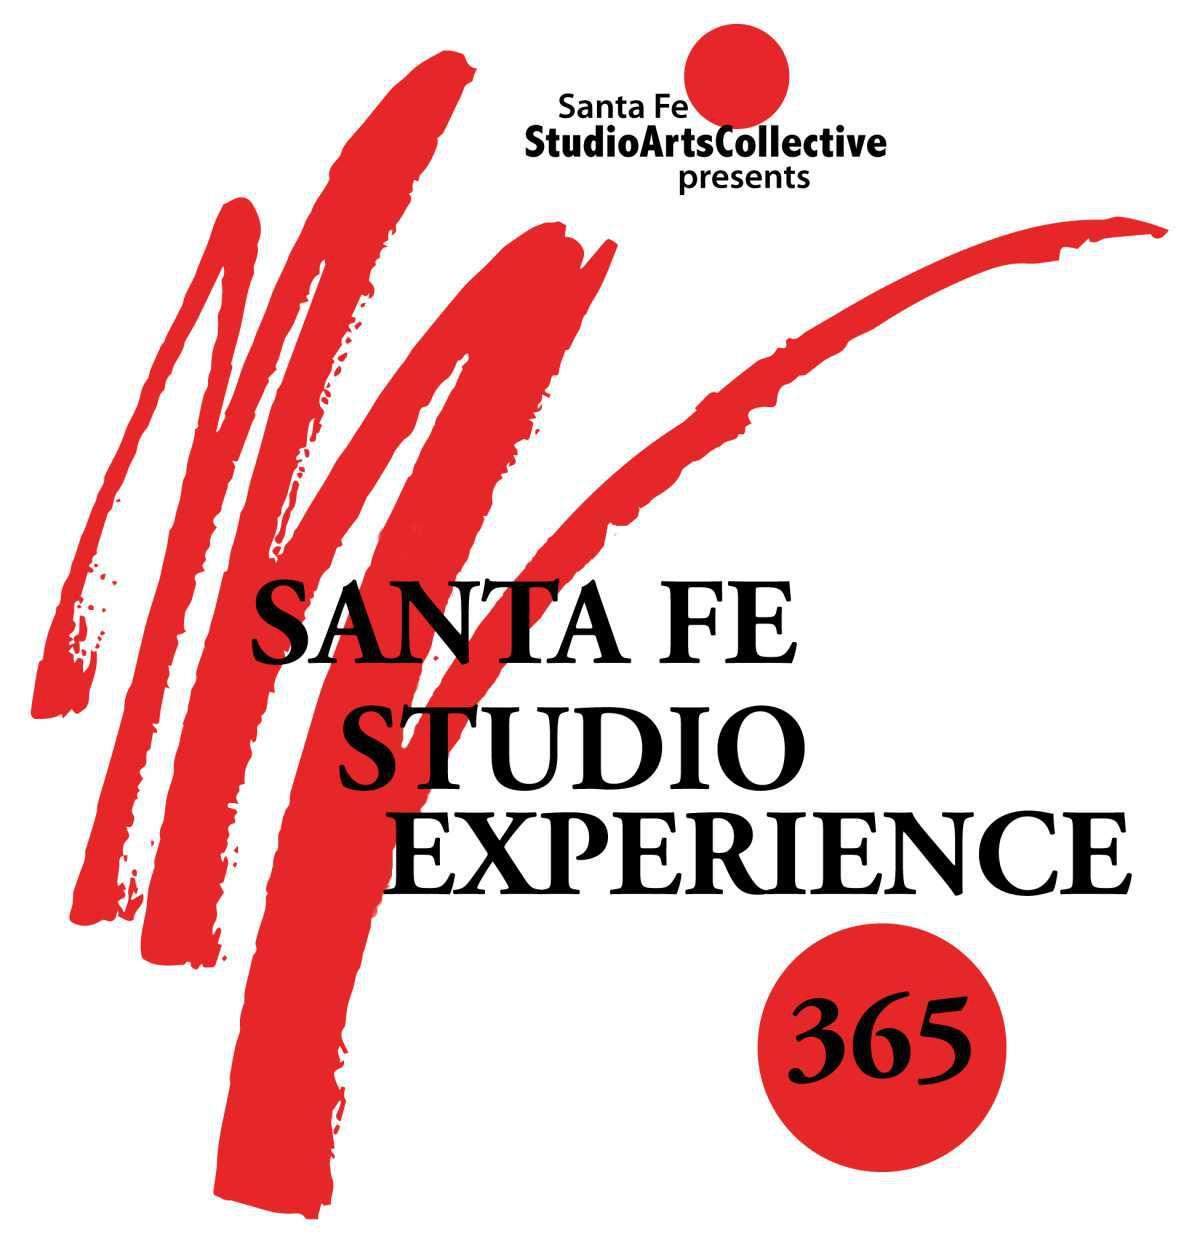 About Santa Fe Studio Experience 365